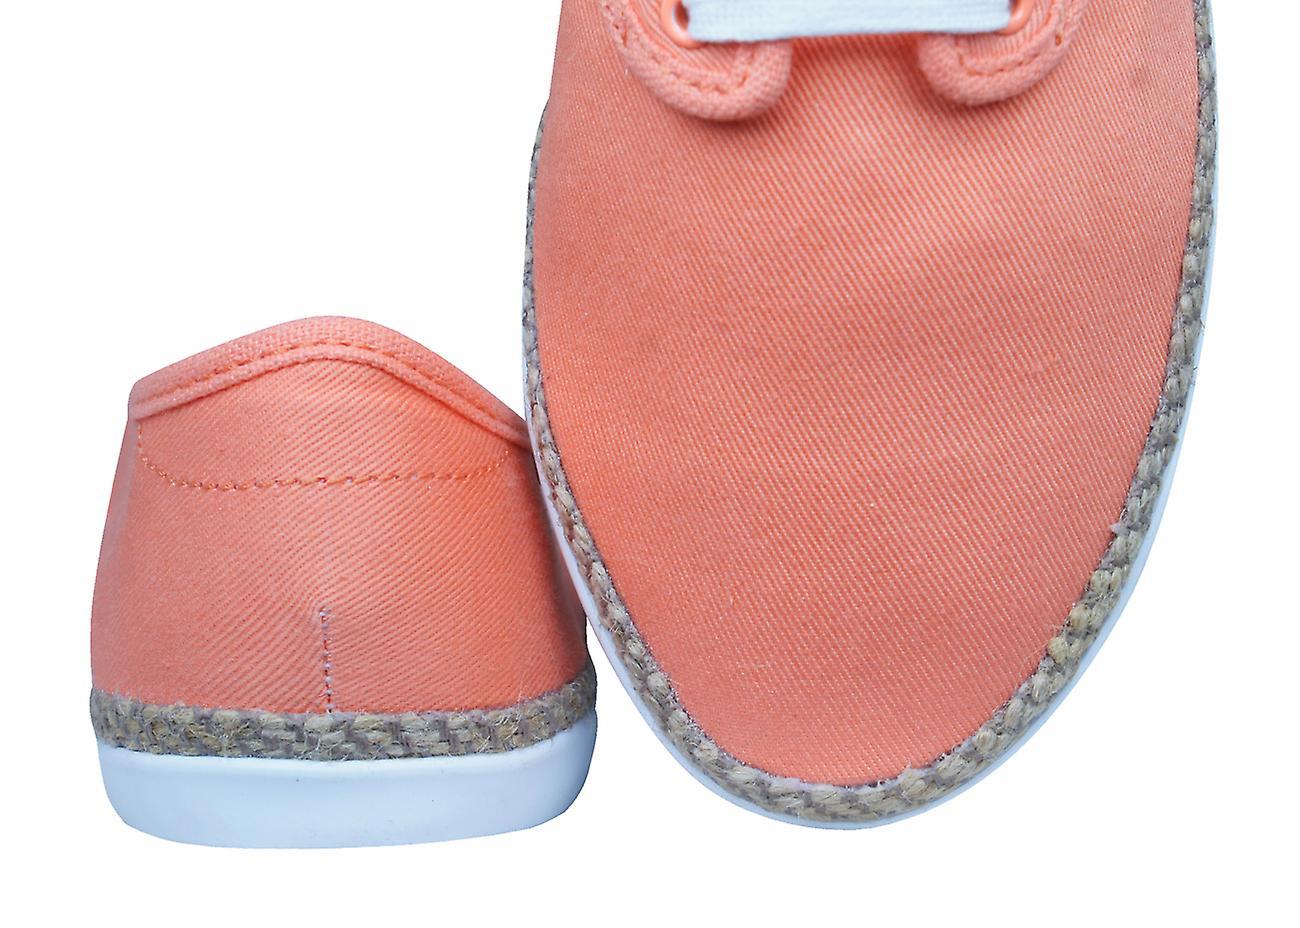 adidas Originals Adria PS Espadrile Womens Trainers / Shoes - Orange